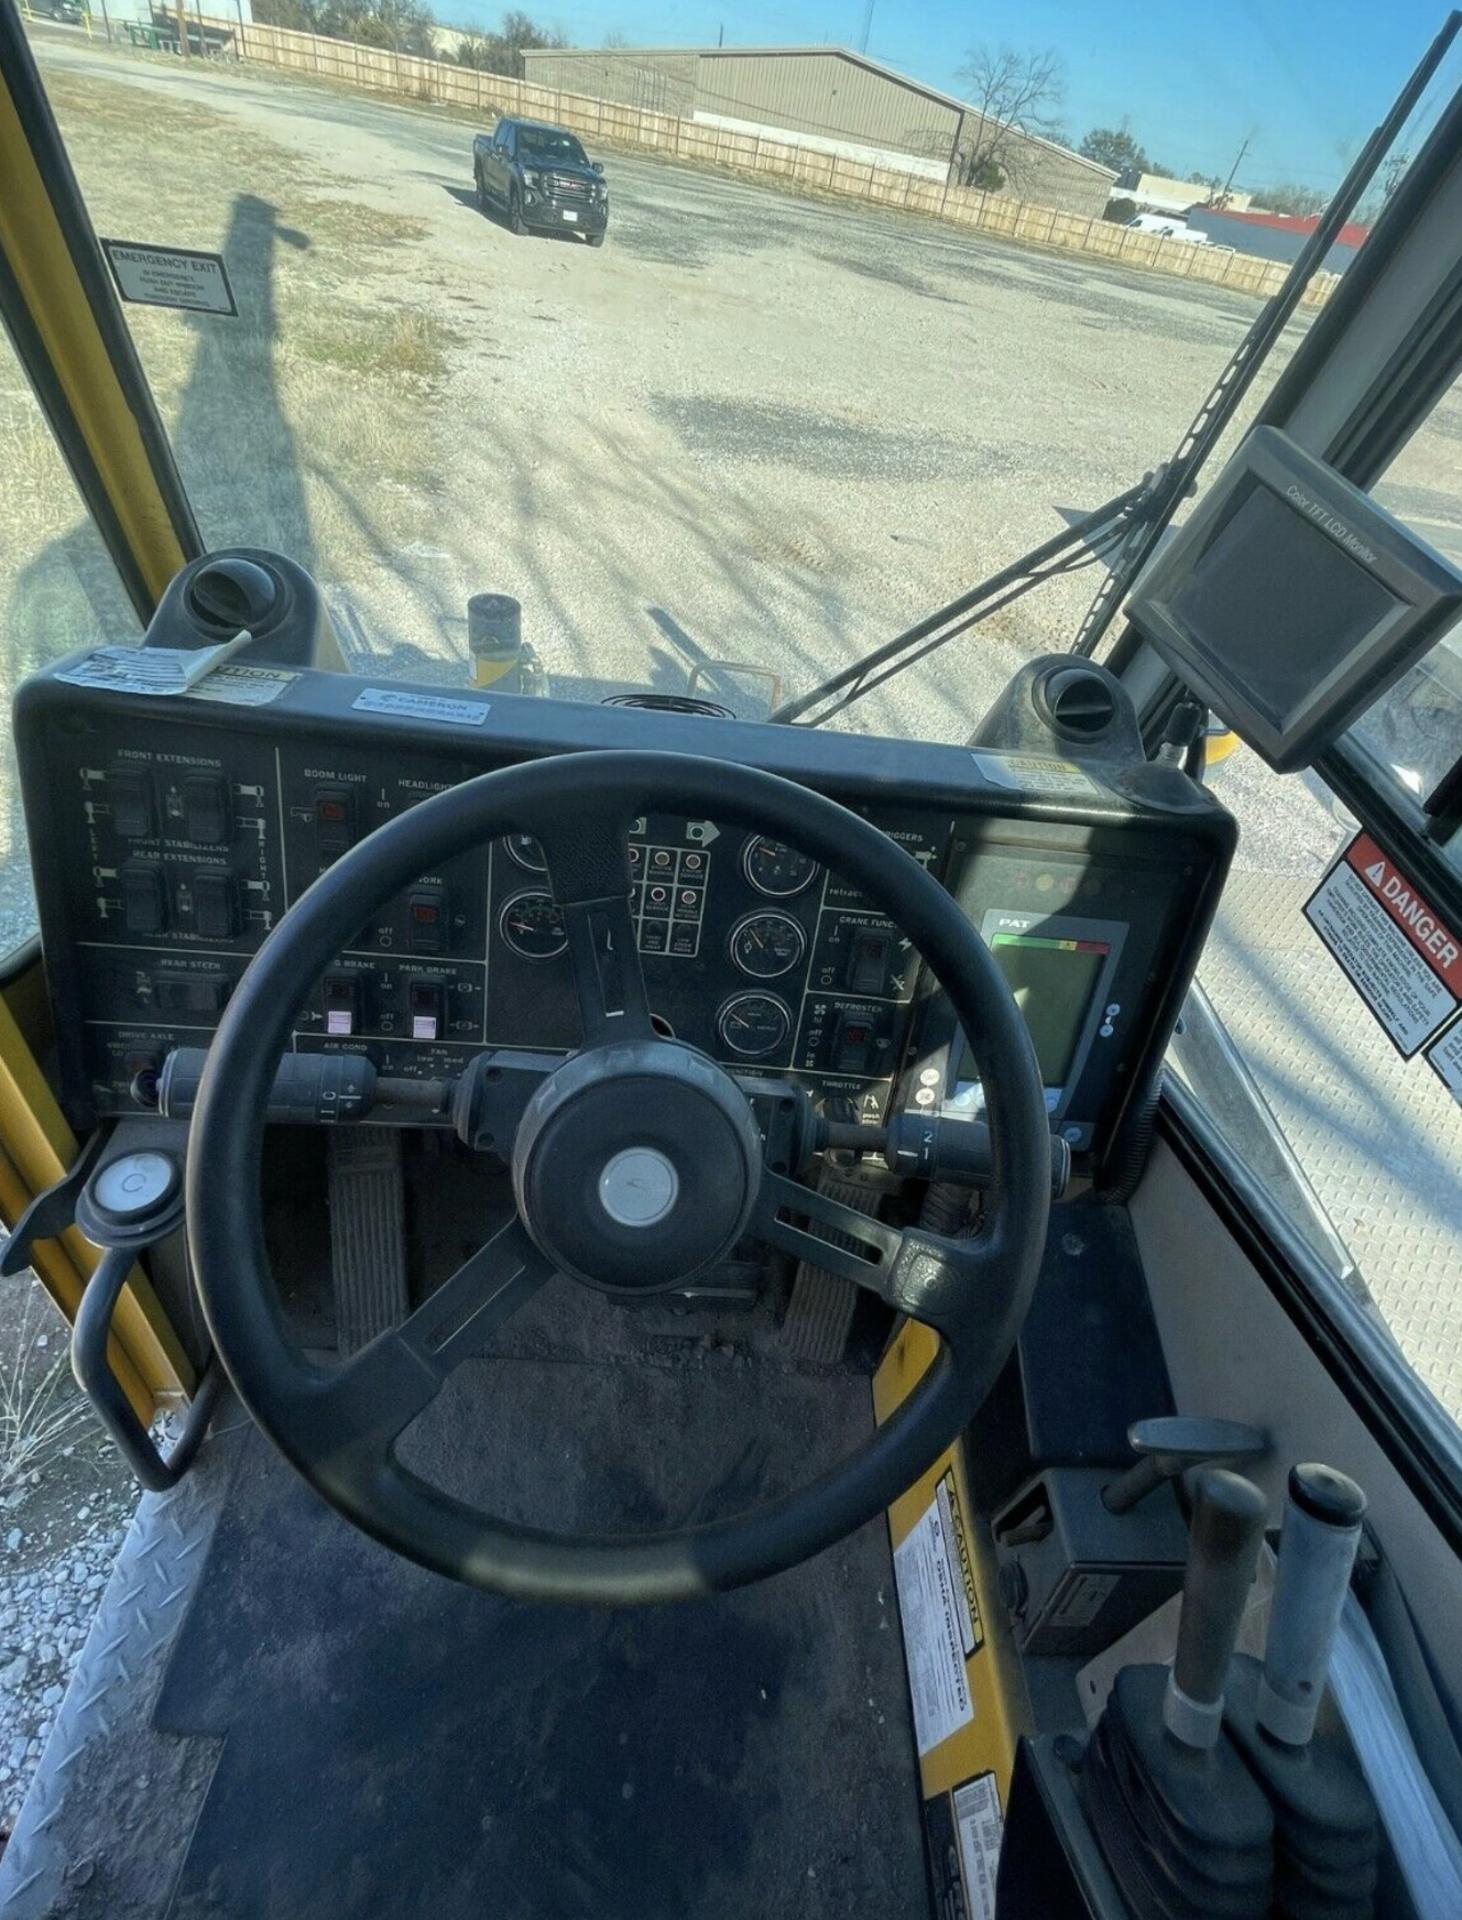 2006 Grove RT530E Crane, 30 Ton Capacity, (LOCATION: EULESS,TX) - Image 6 of 7